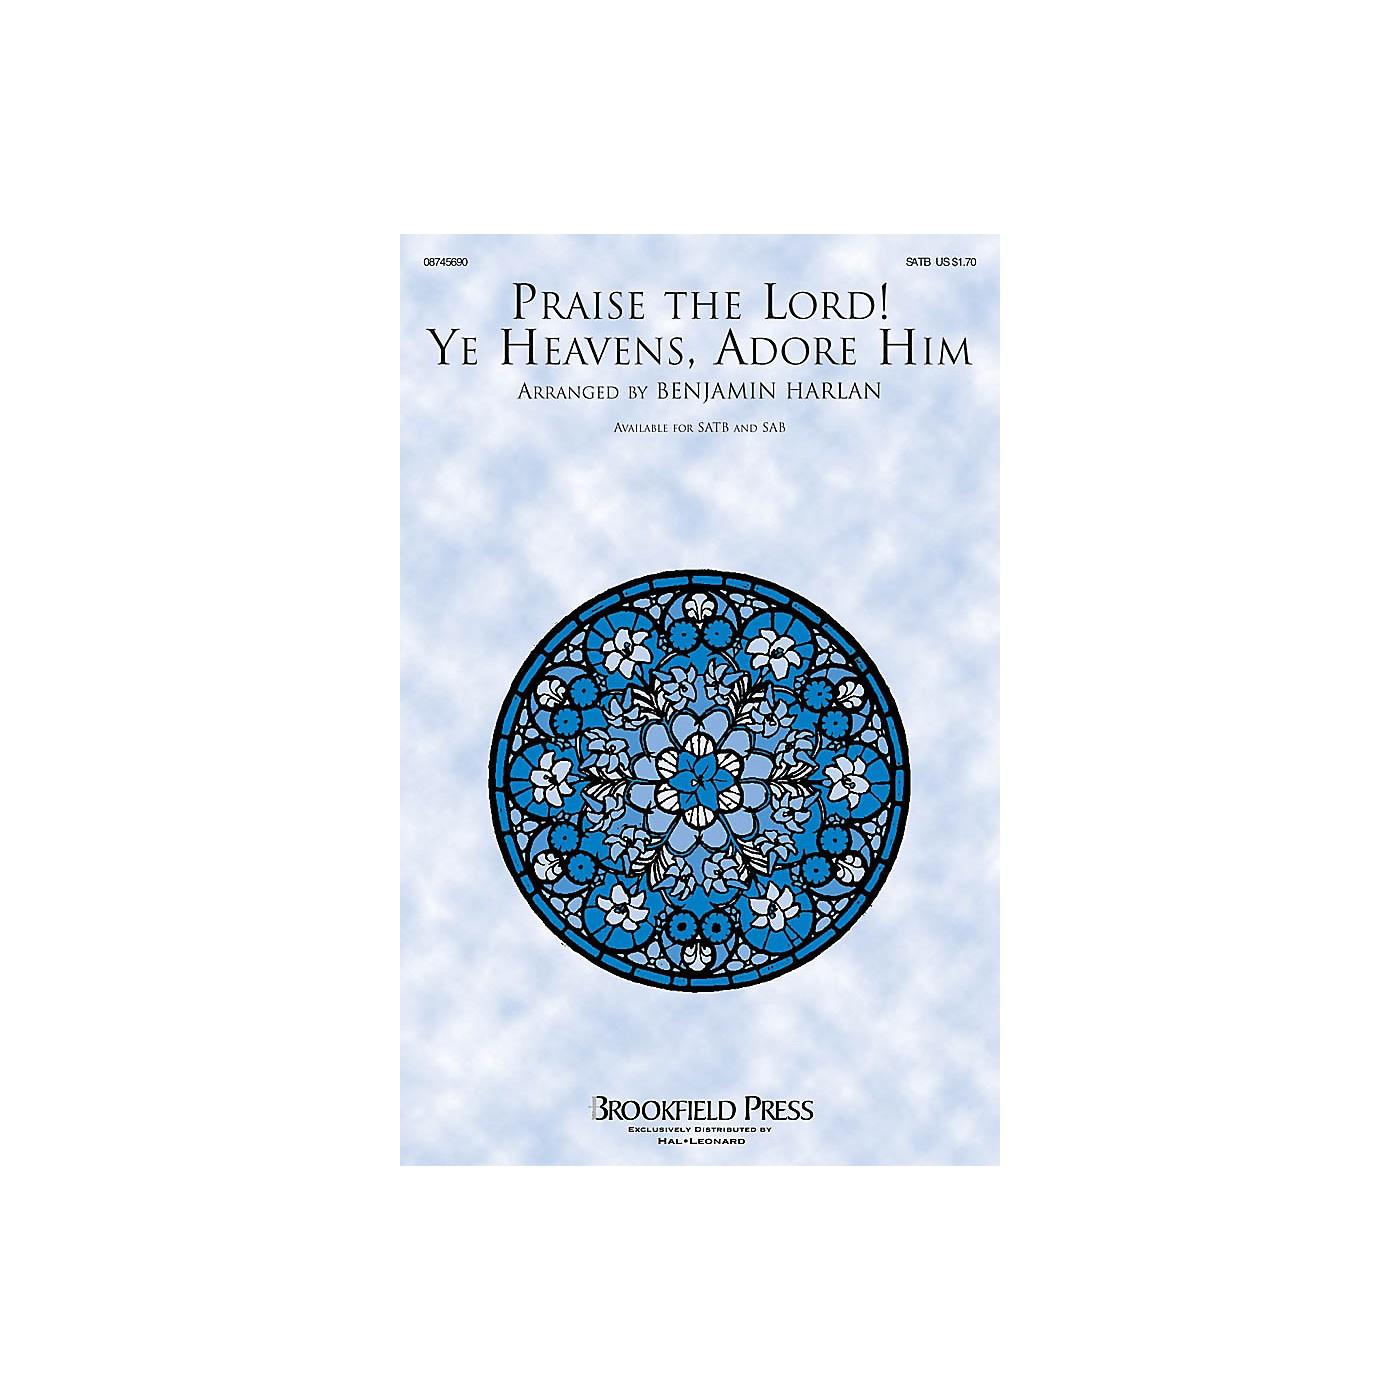 Brookfield Praise the Lord! Ye Heavens, Adore Him SATB arranged by Benjamin Harlan thumbnail